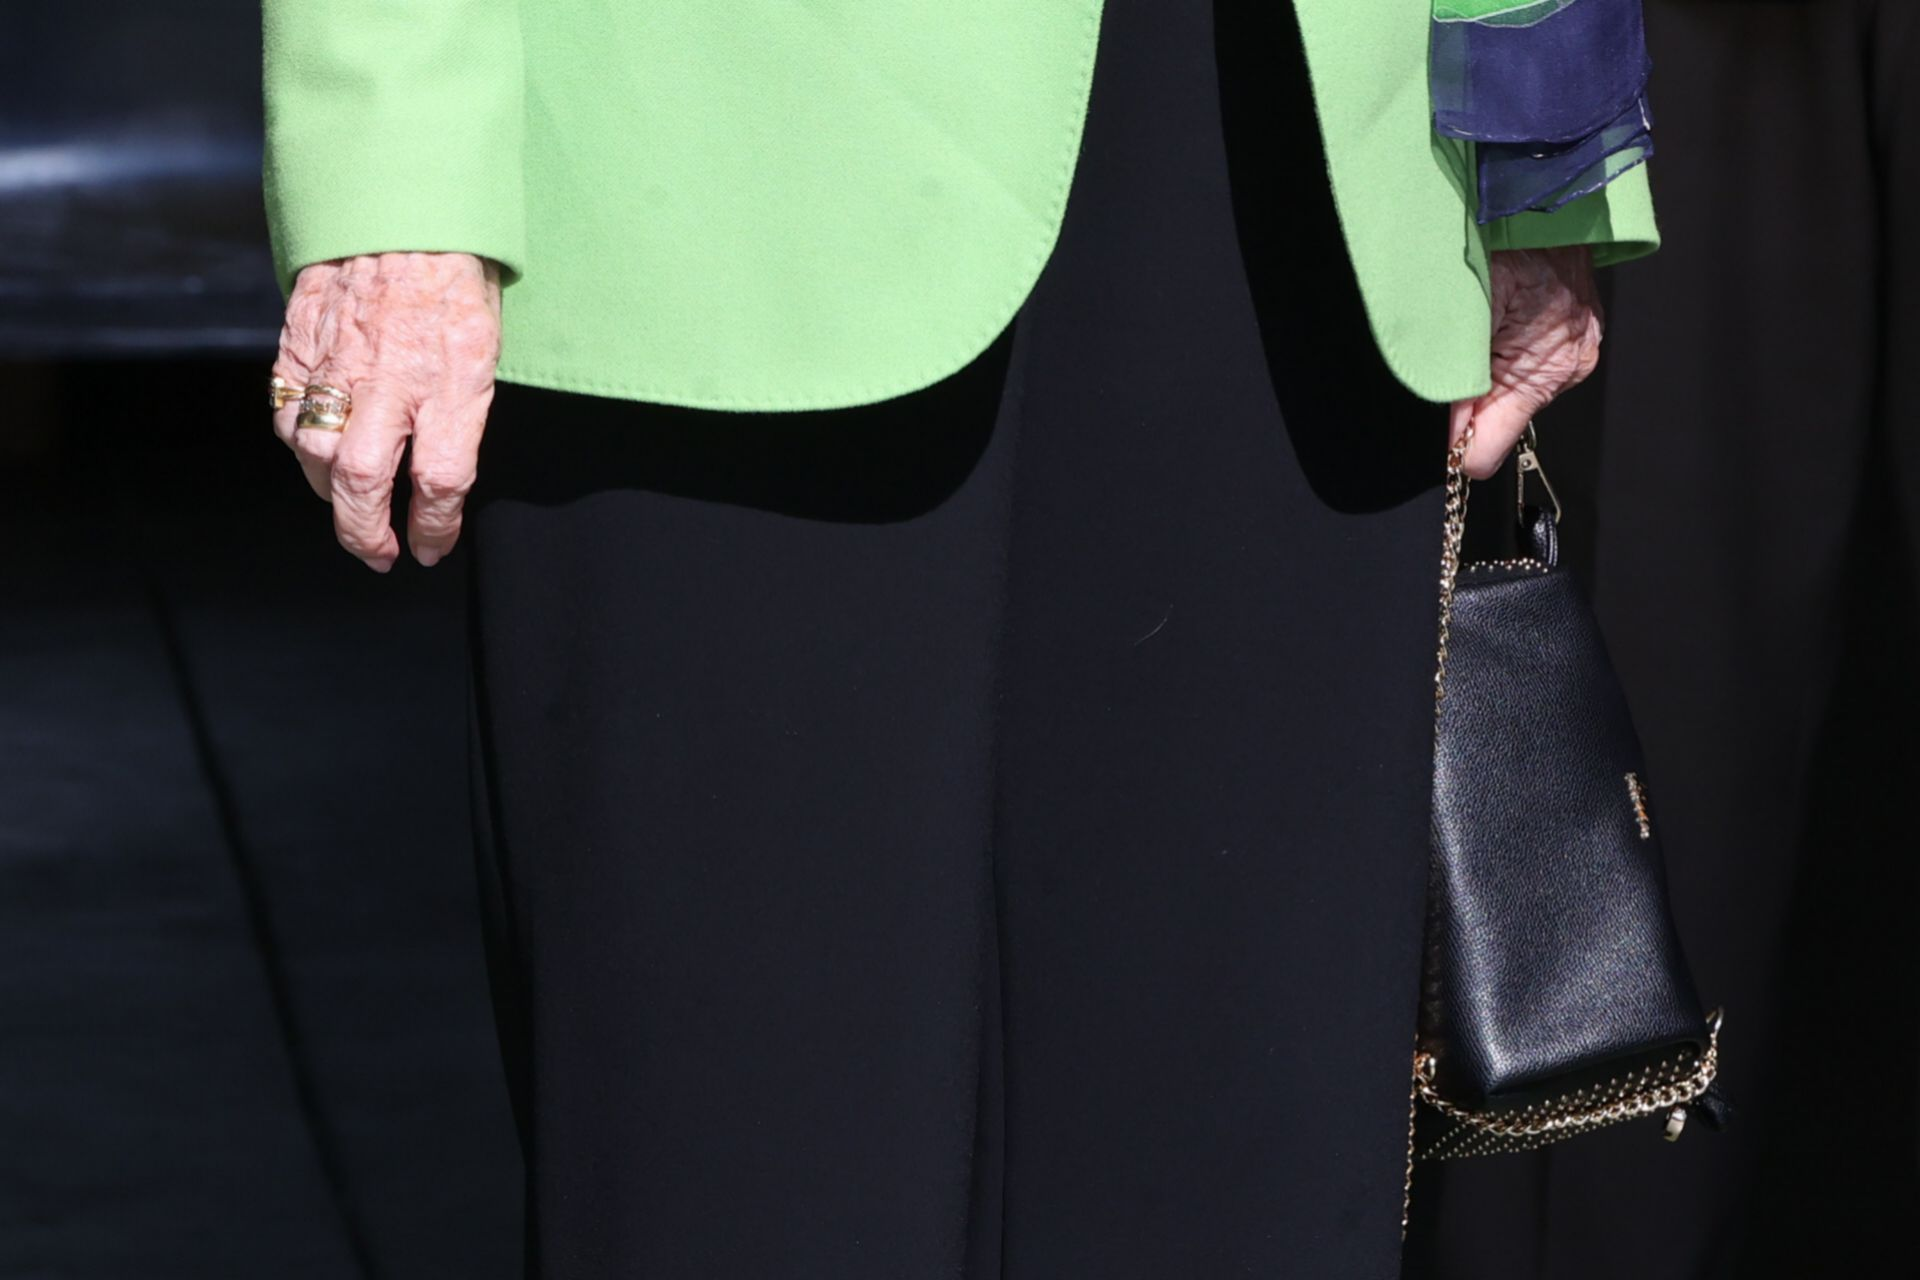 Detalle de las manos de la reina.